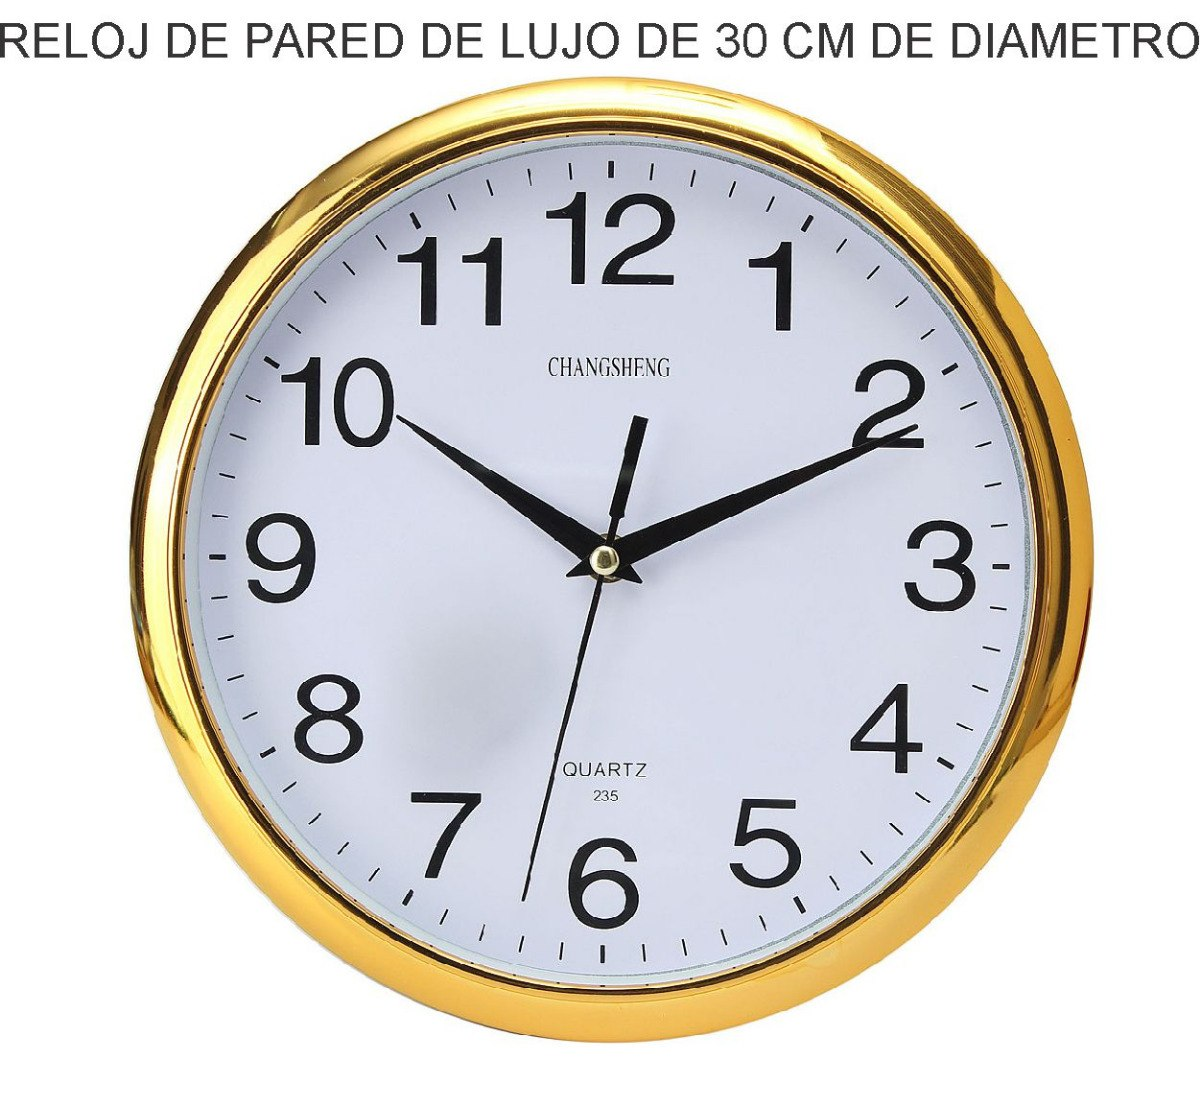 Reloj de pared de lujo cocina regalo empresa logo dorado - Relojes pared cocina ...